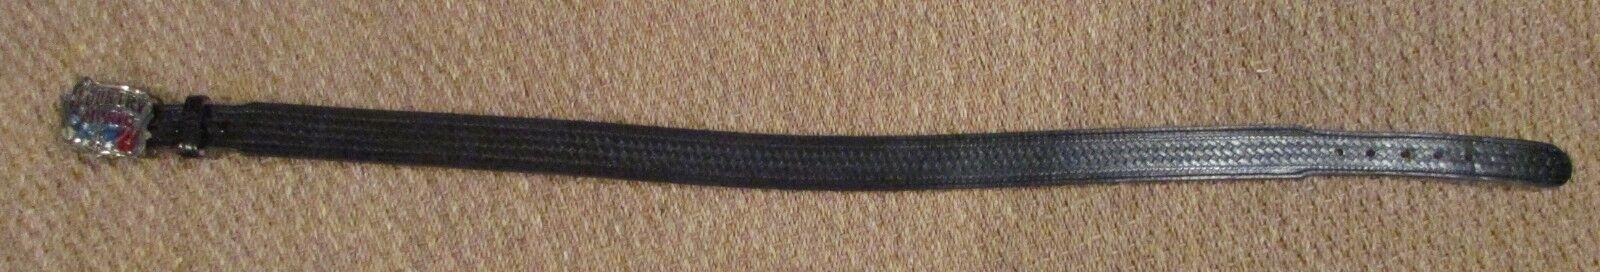 Handgefertigt Schwarzer Ledergürtel Größe 38 mit Großer Land Musik Gürtel Buckle